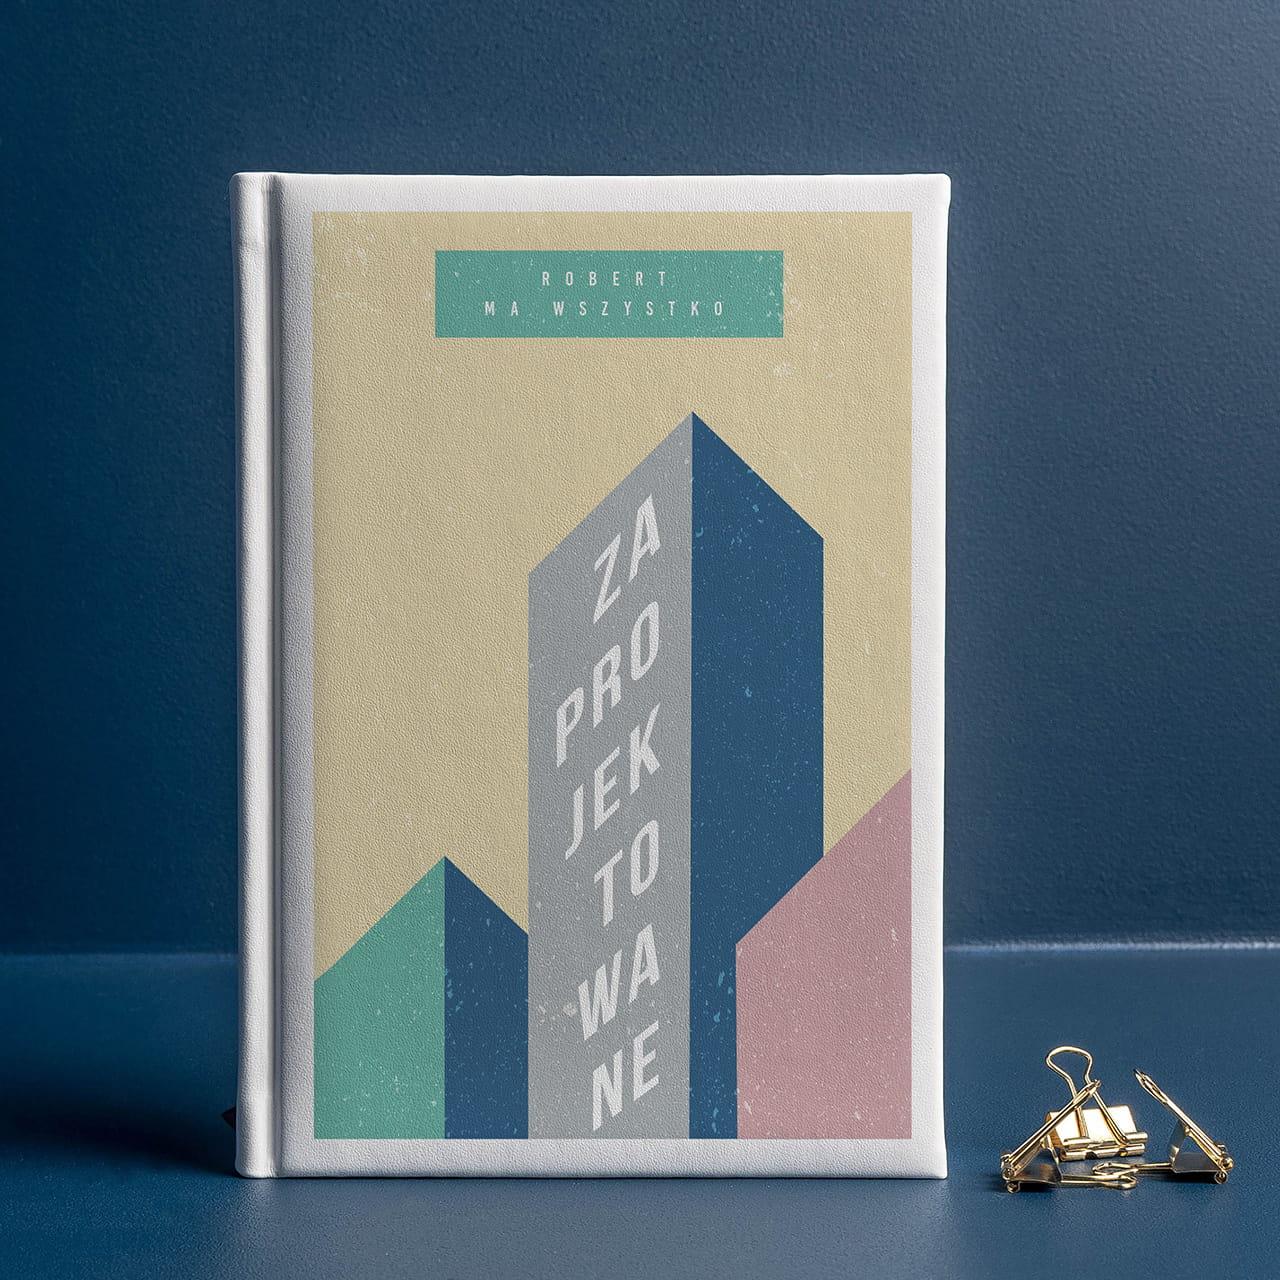 Kalendarz dla architekta